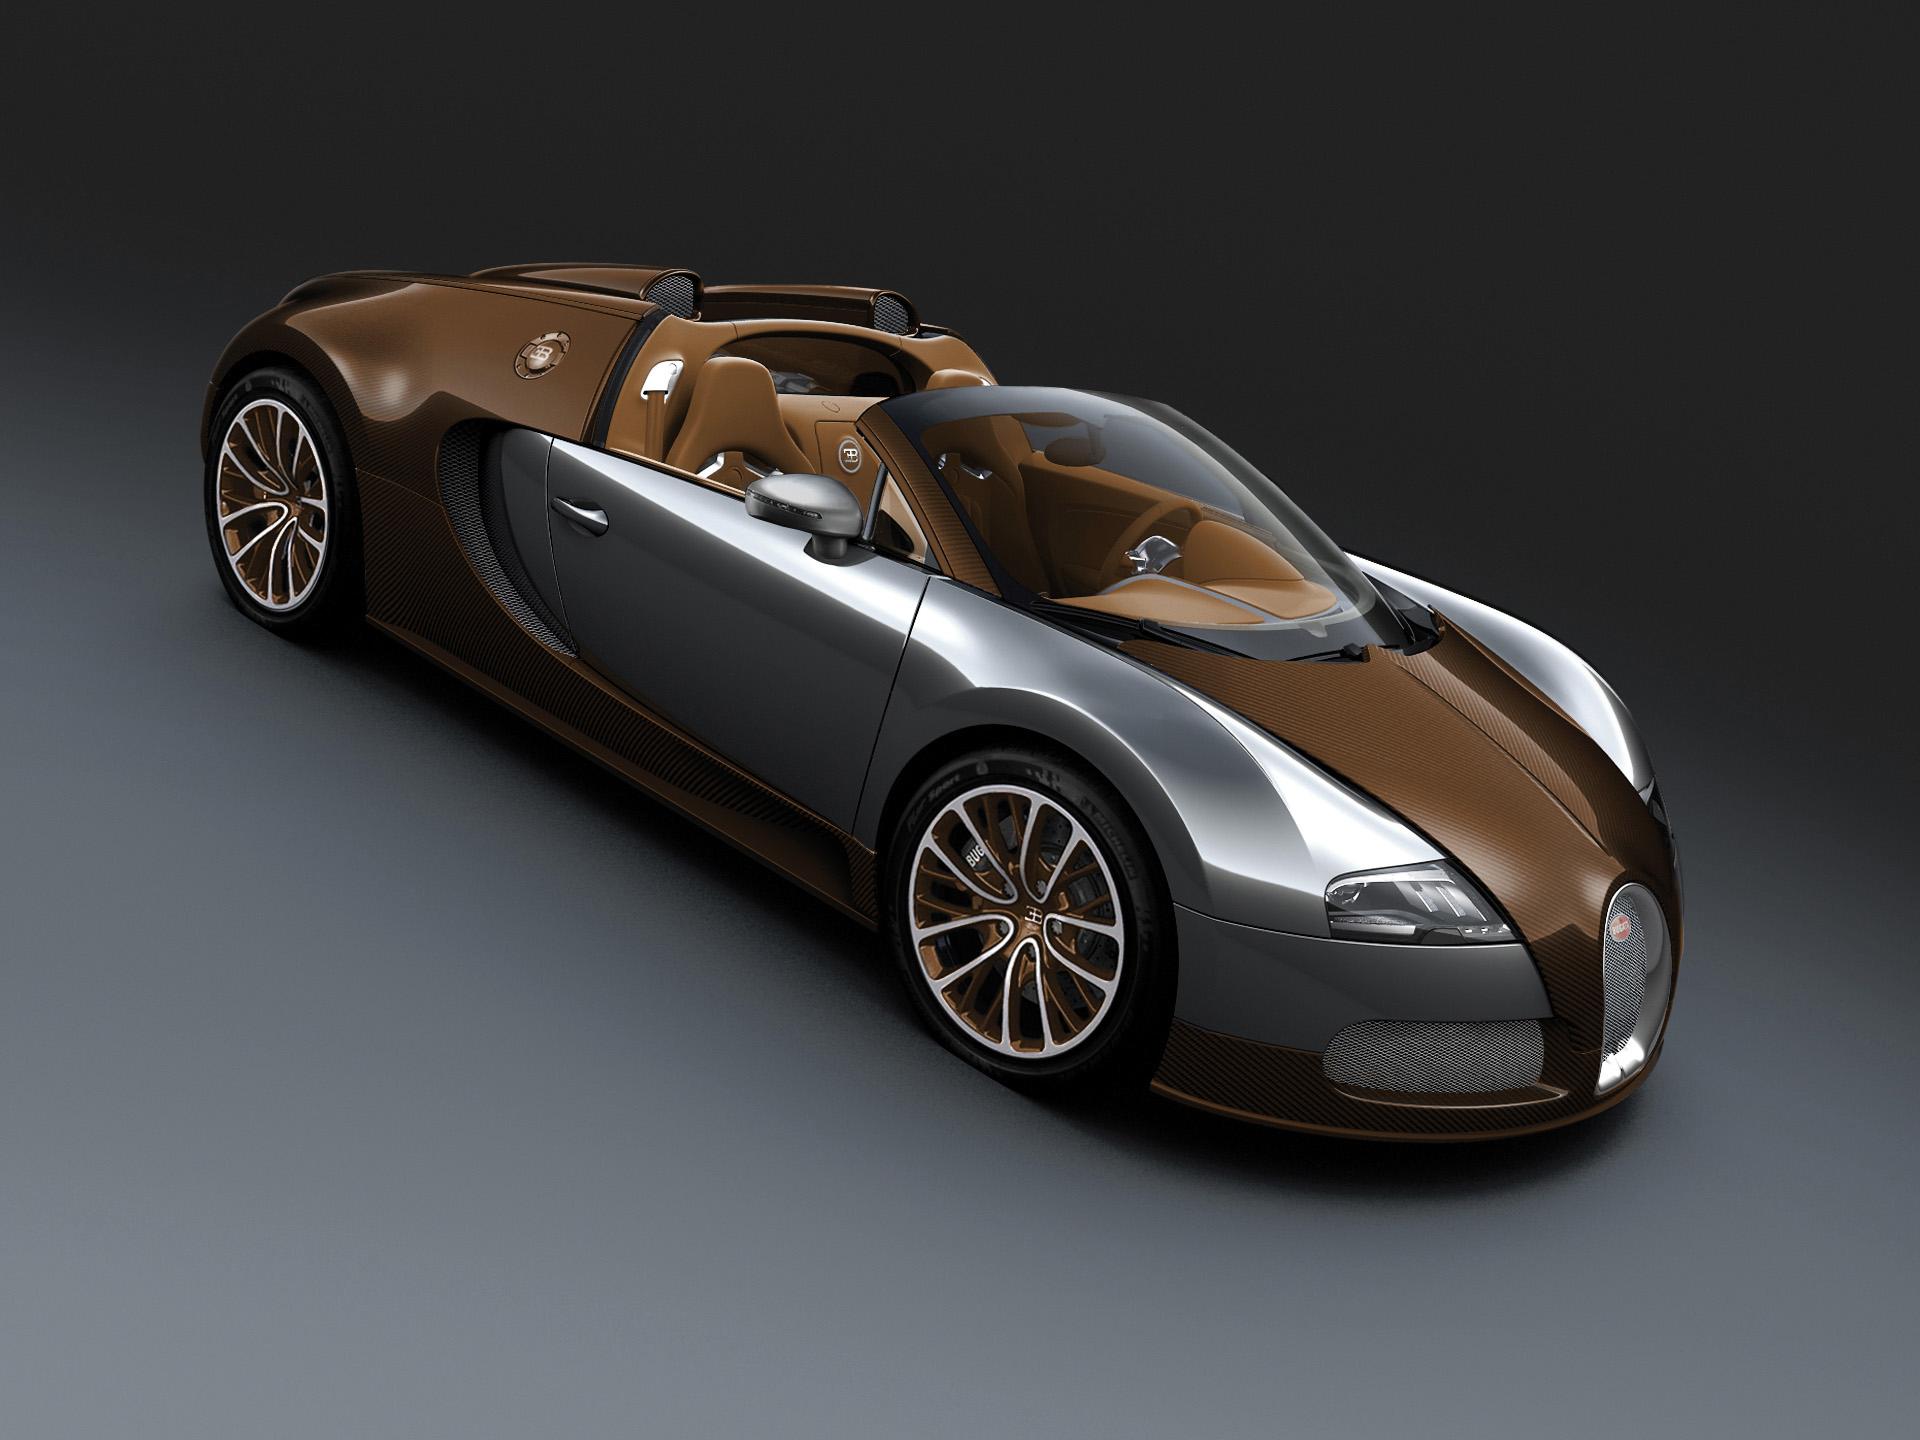 2012-Bugatti-Veyron-16-4-GS-Brown-01 Remarkable Bugatti Veyron Grand Sport 2015 Price Cars Trend